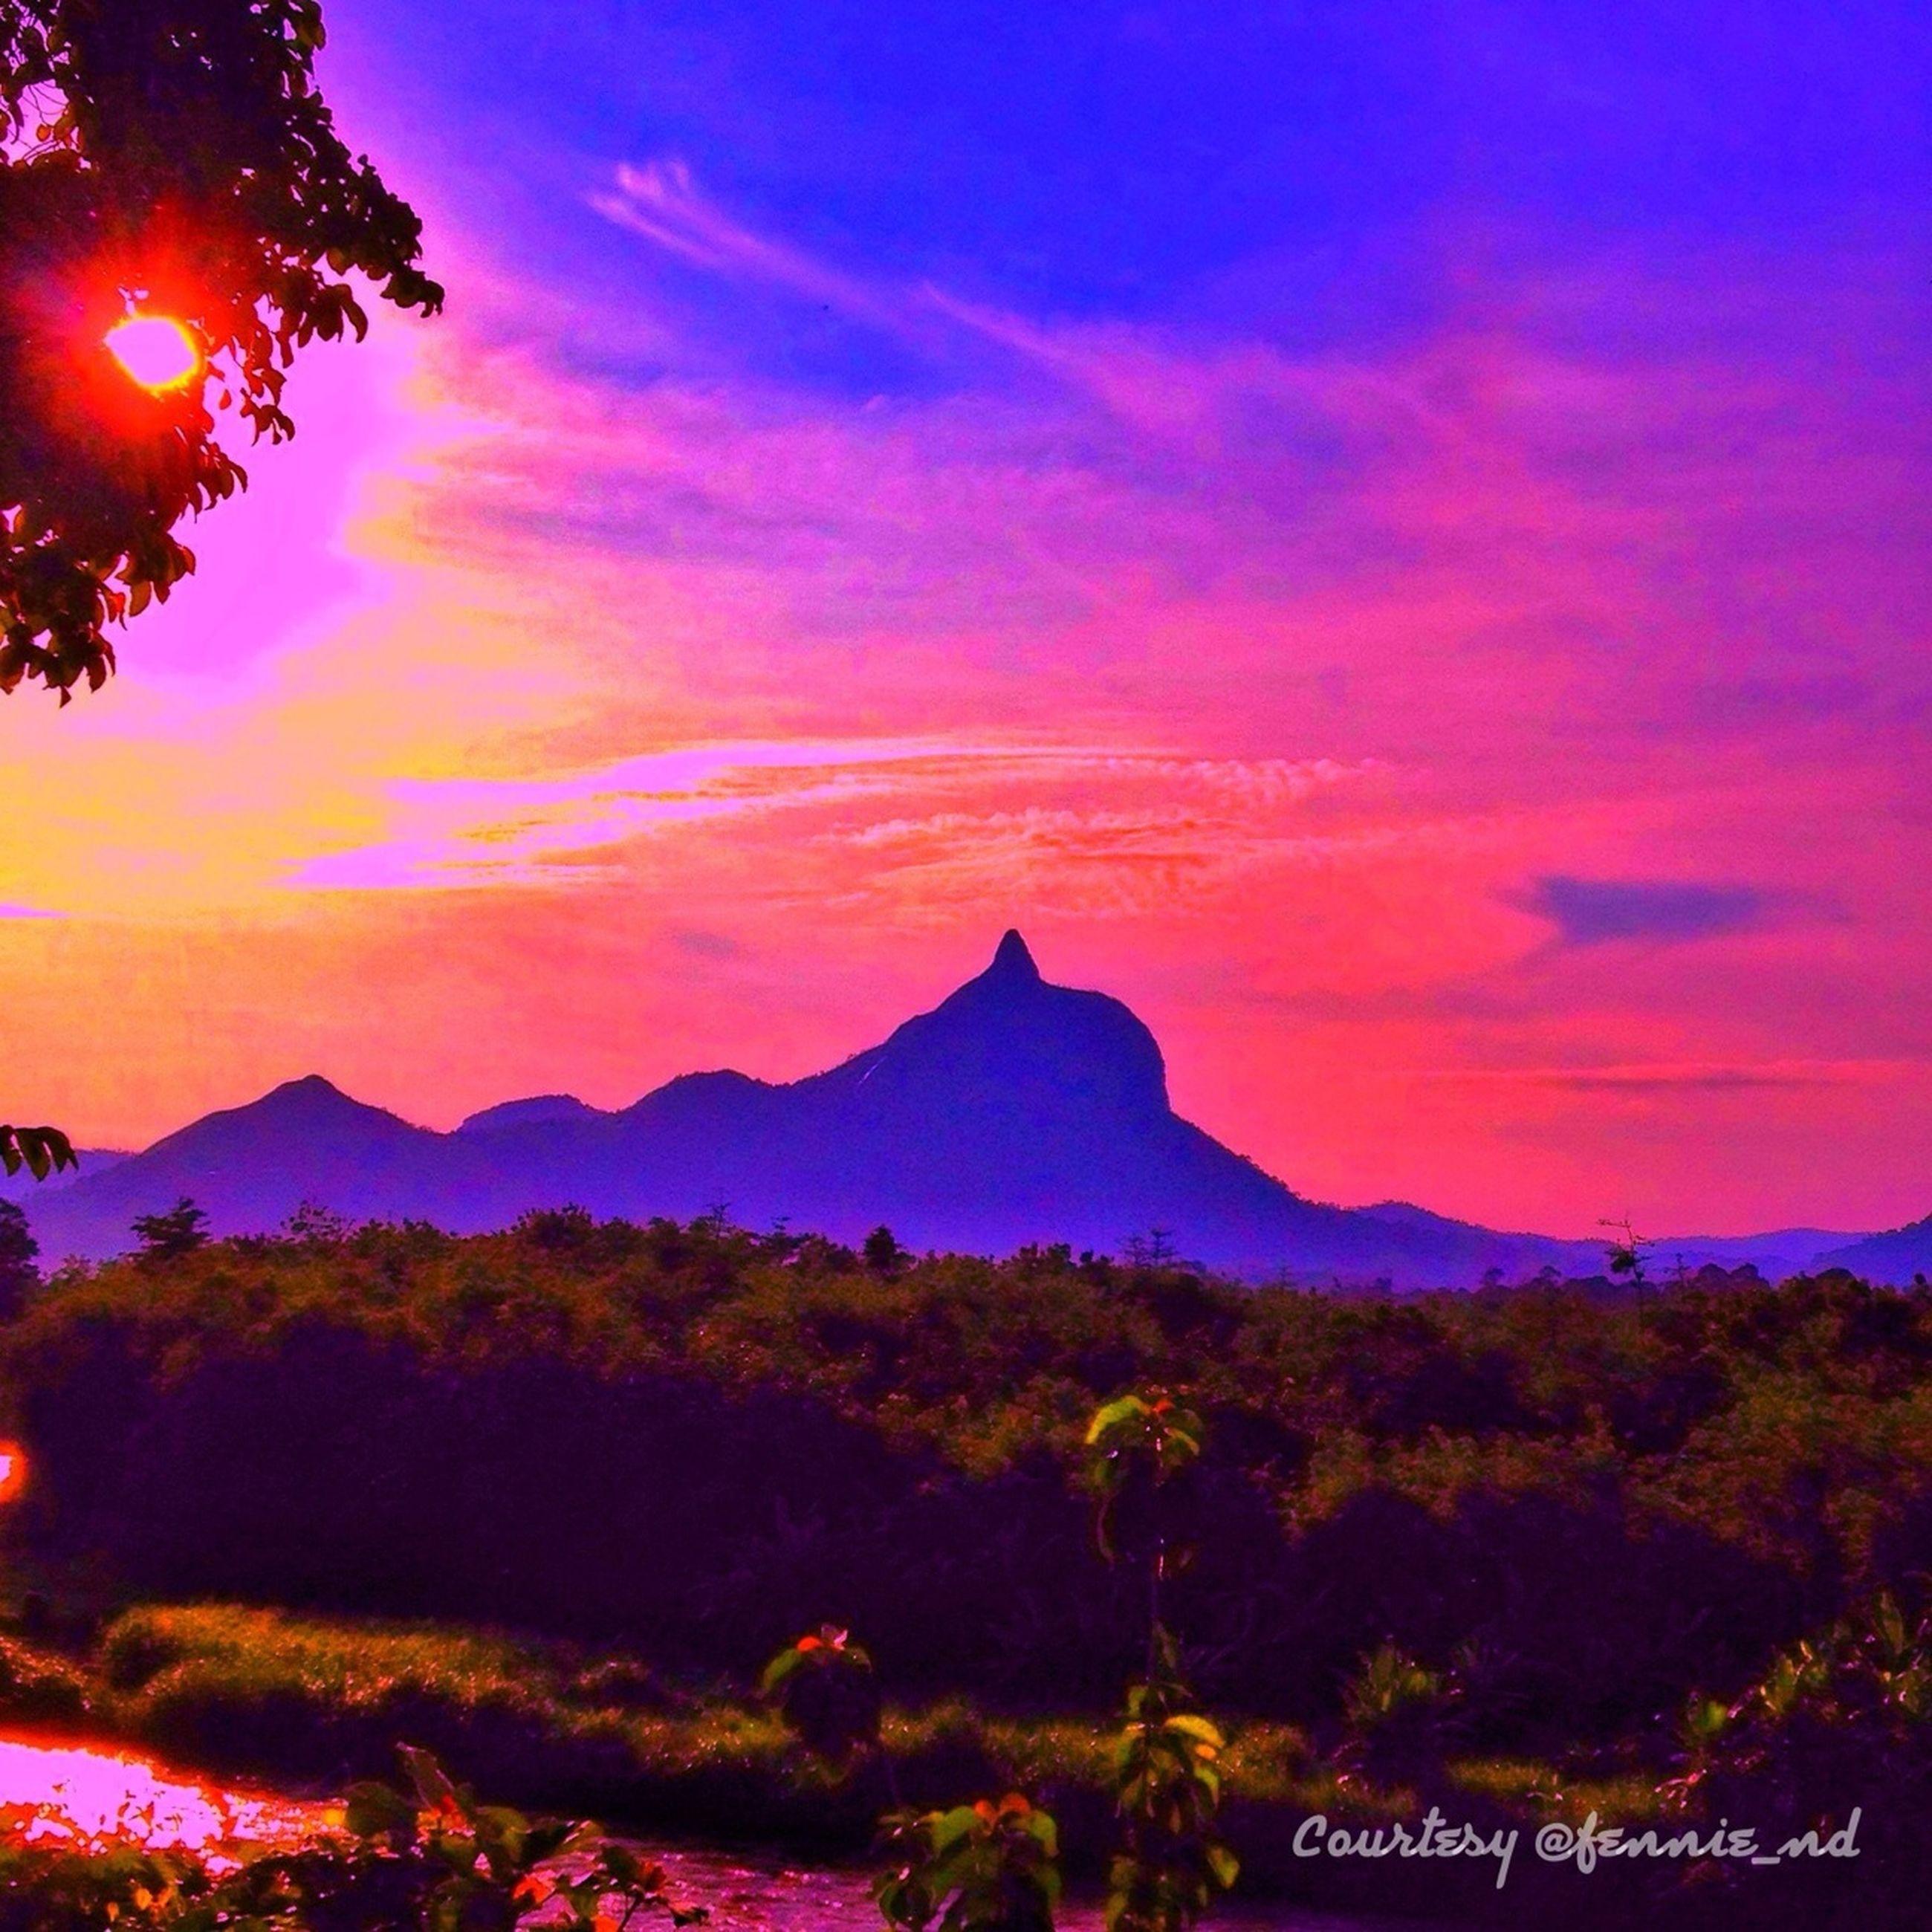 sunset, mountain, scenics, sky, tree, beauty in nature, tranquil scene, tranquility, silhouette, orange color, nature, cloud - sky, idyllic, mountain range, landscape, dusk, cloud, travel destinations, majestic, tourism